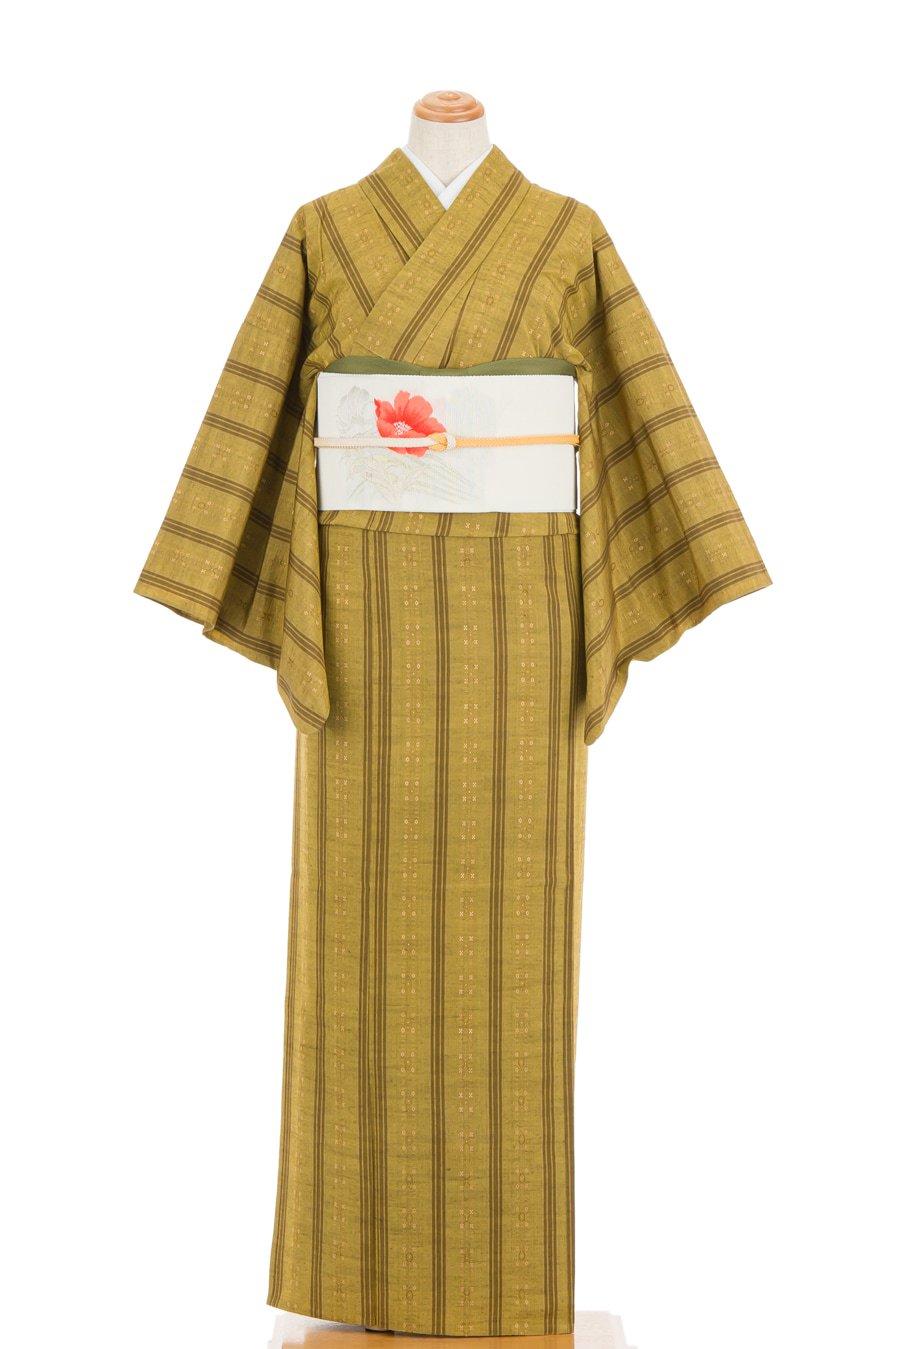 「単衣 紬 菜種油色地に細縞」の商品画像